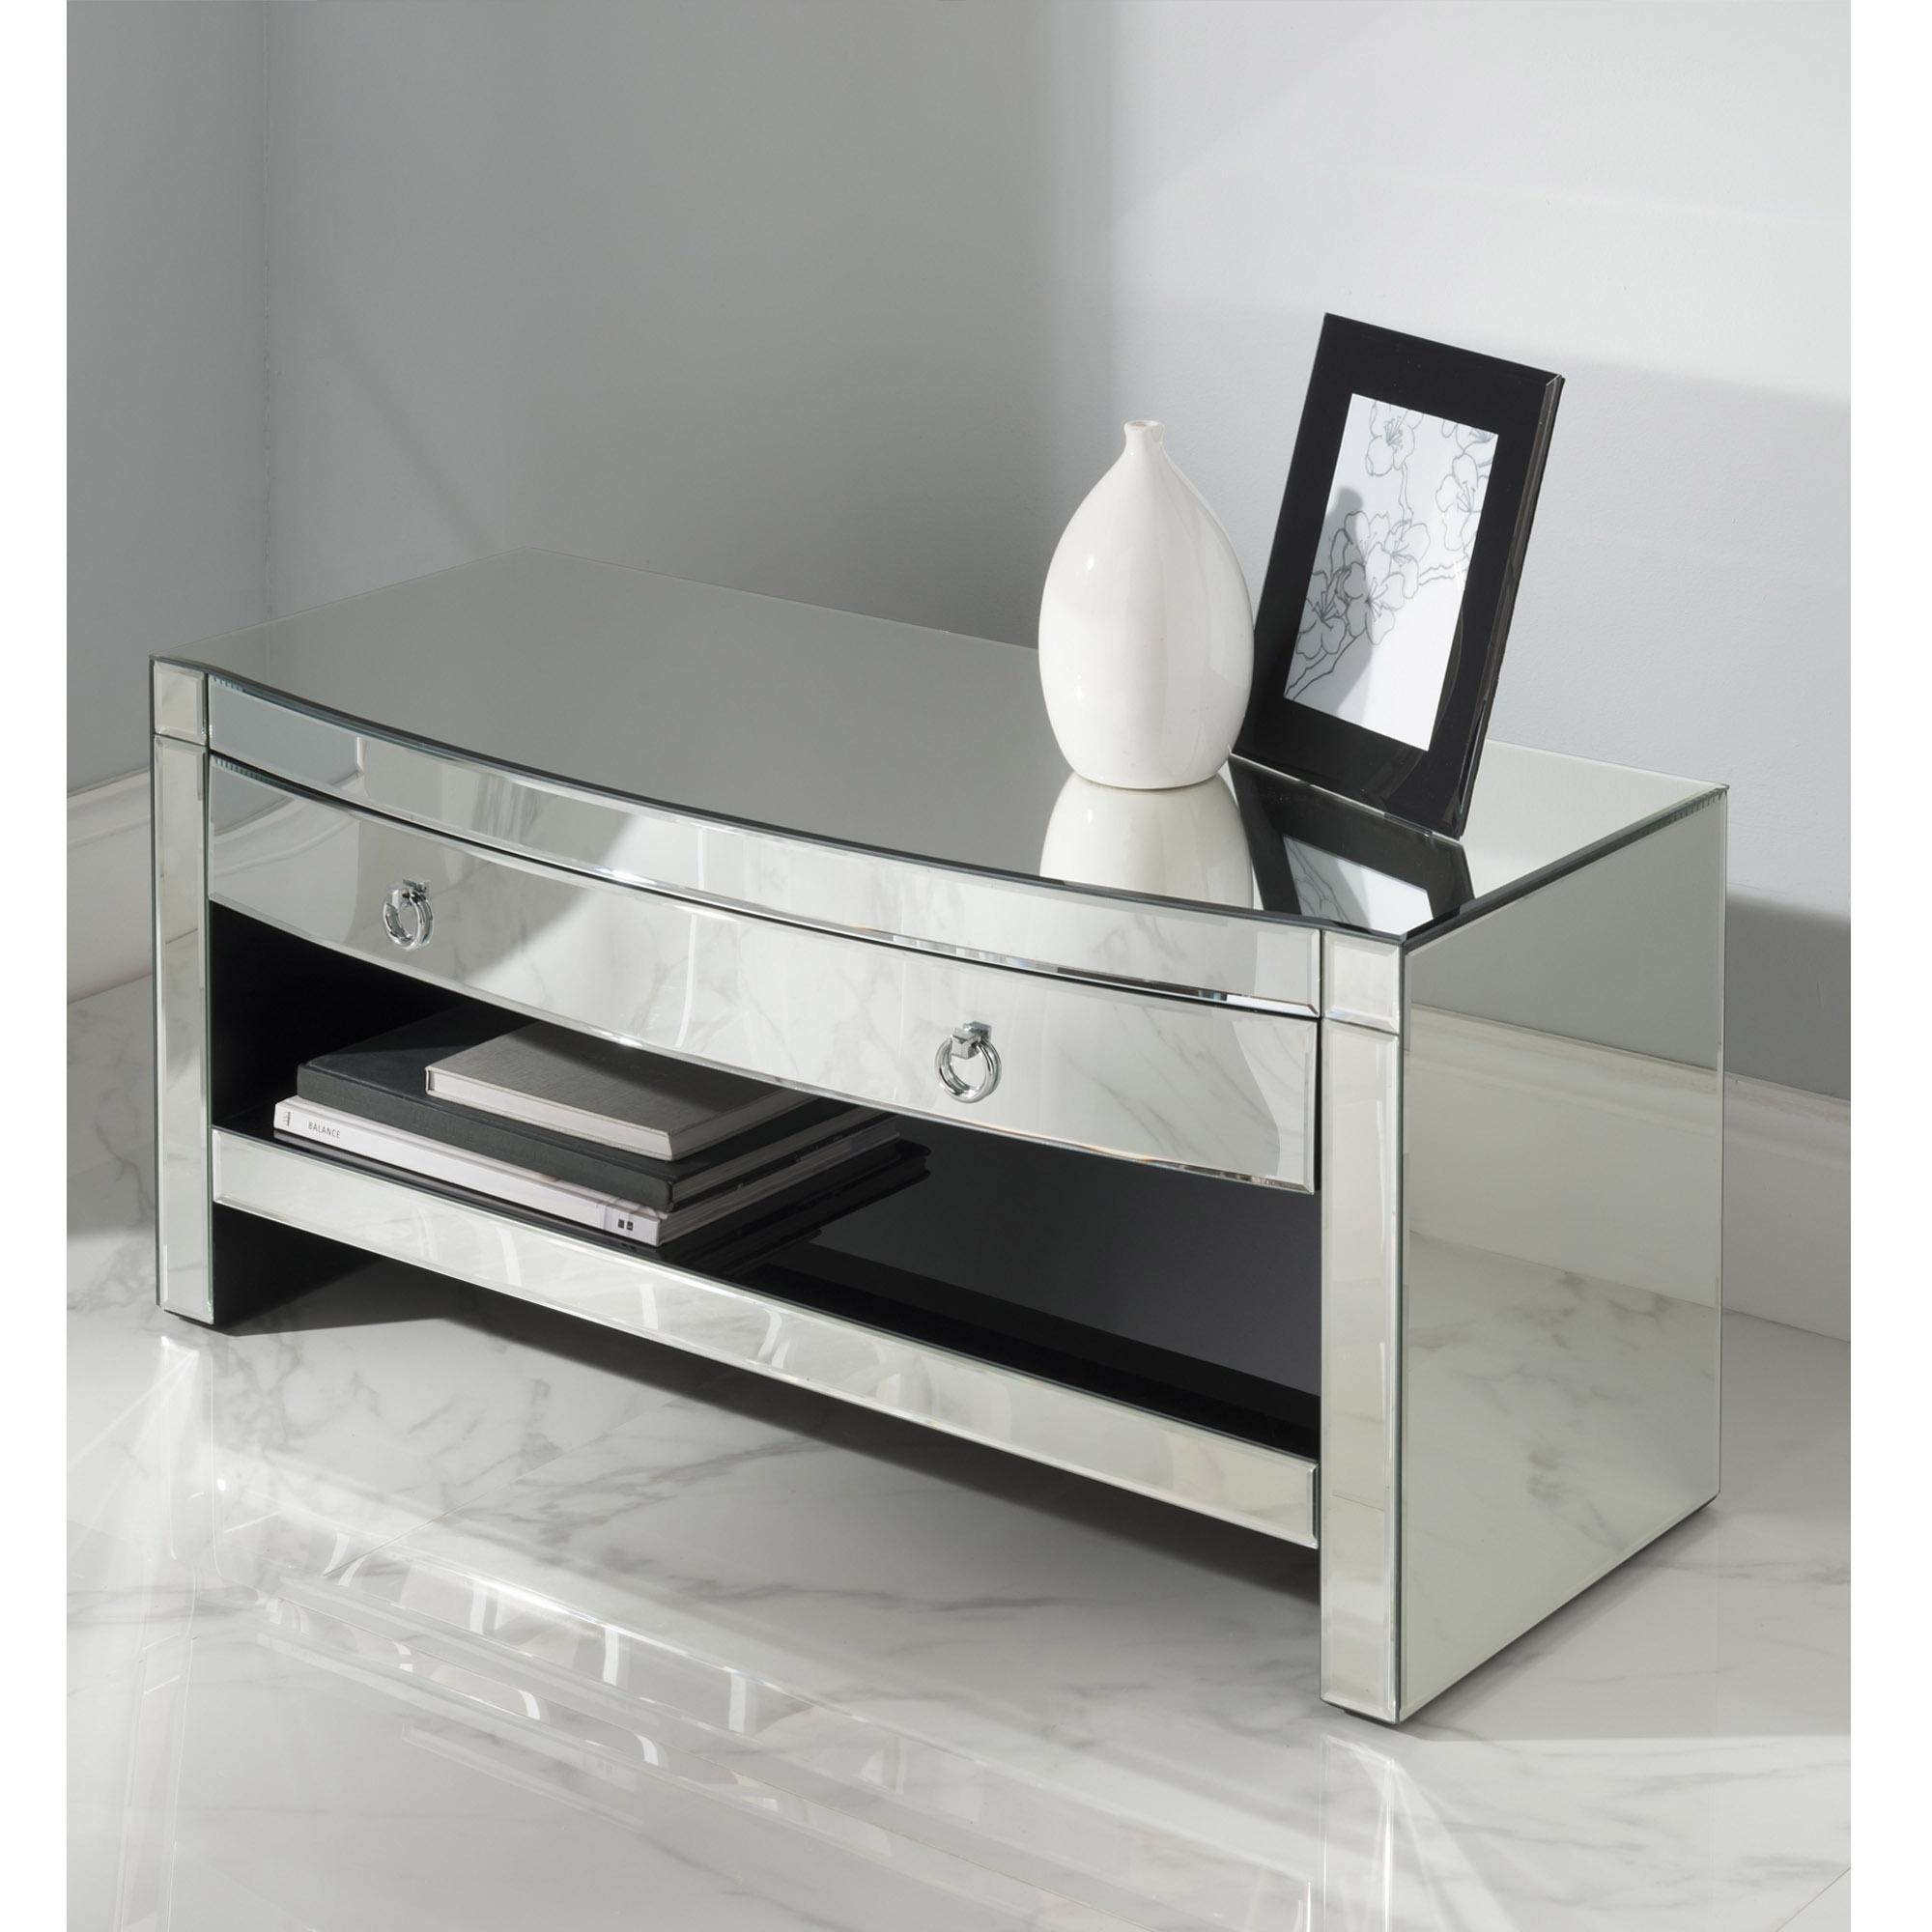 Venetian Glass Furniture (View 12 of 20)